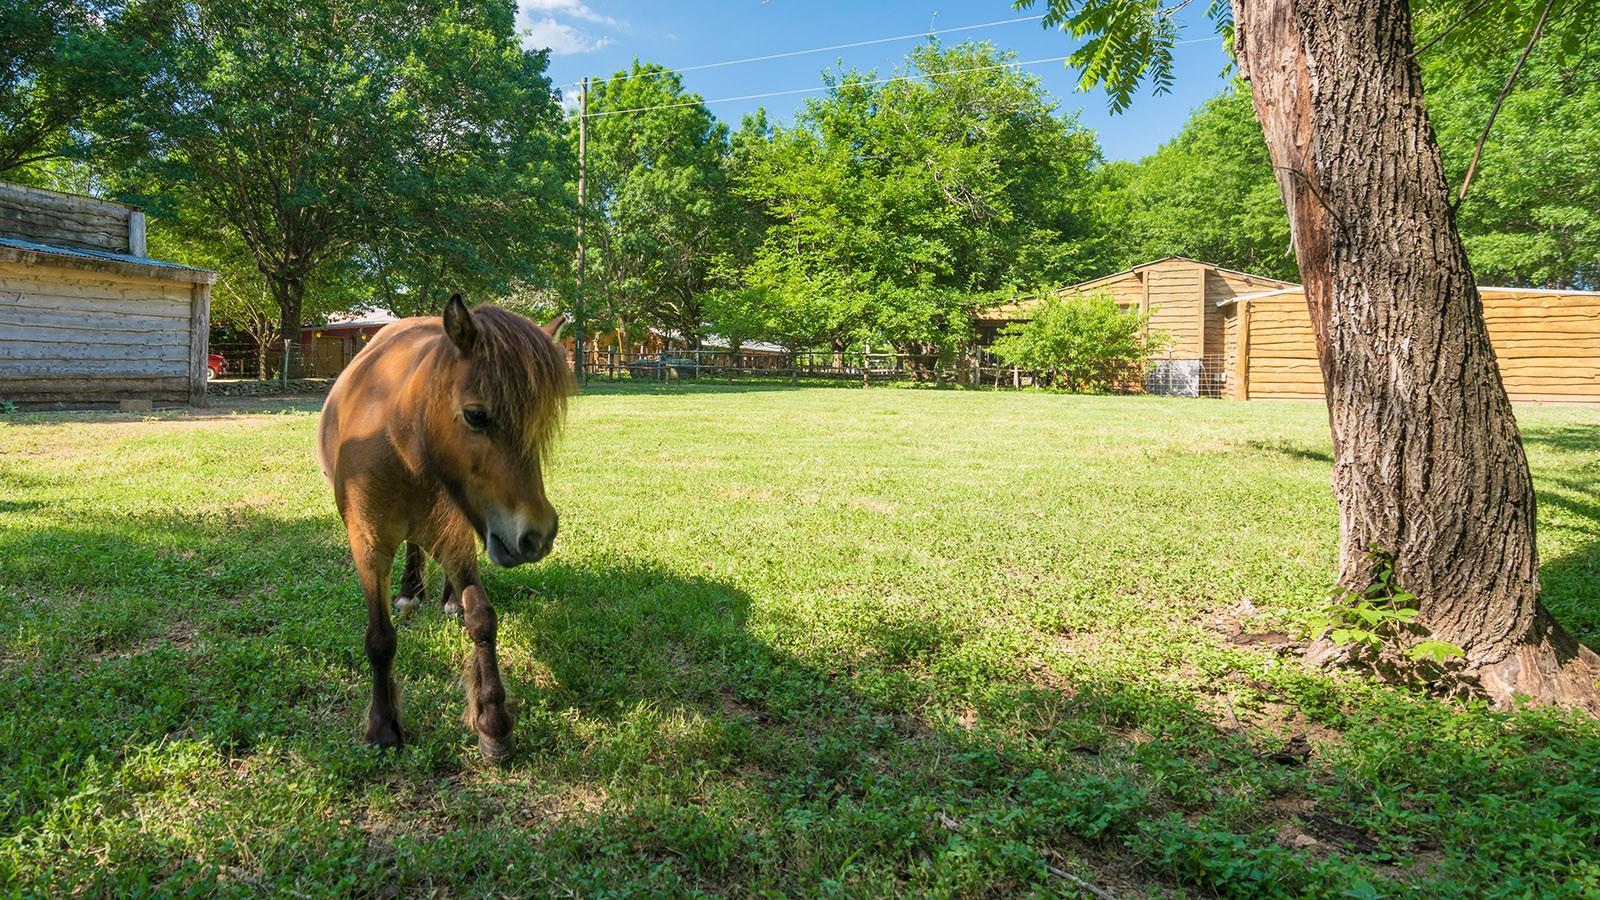 brown horse standing in grassy field near barn